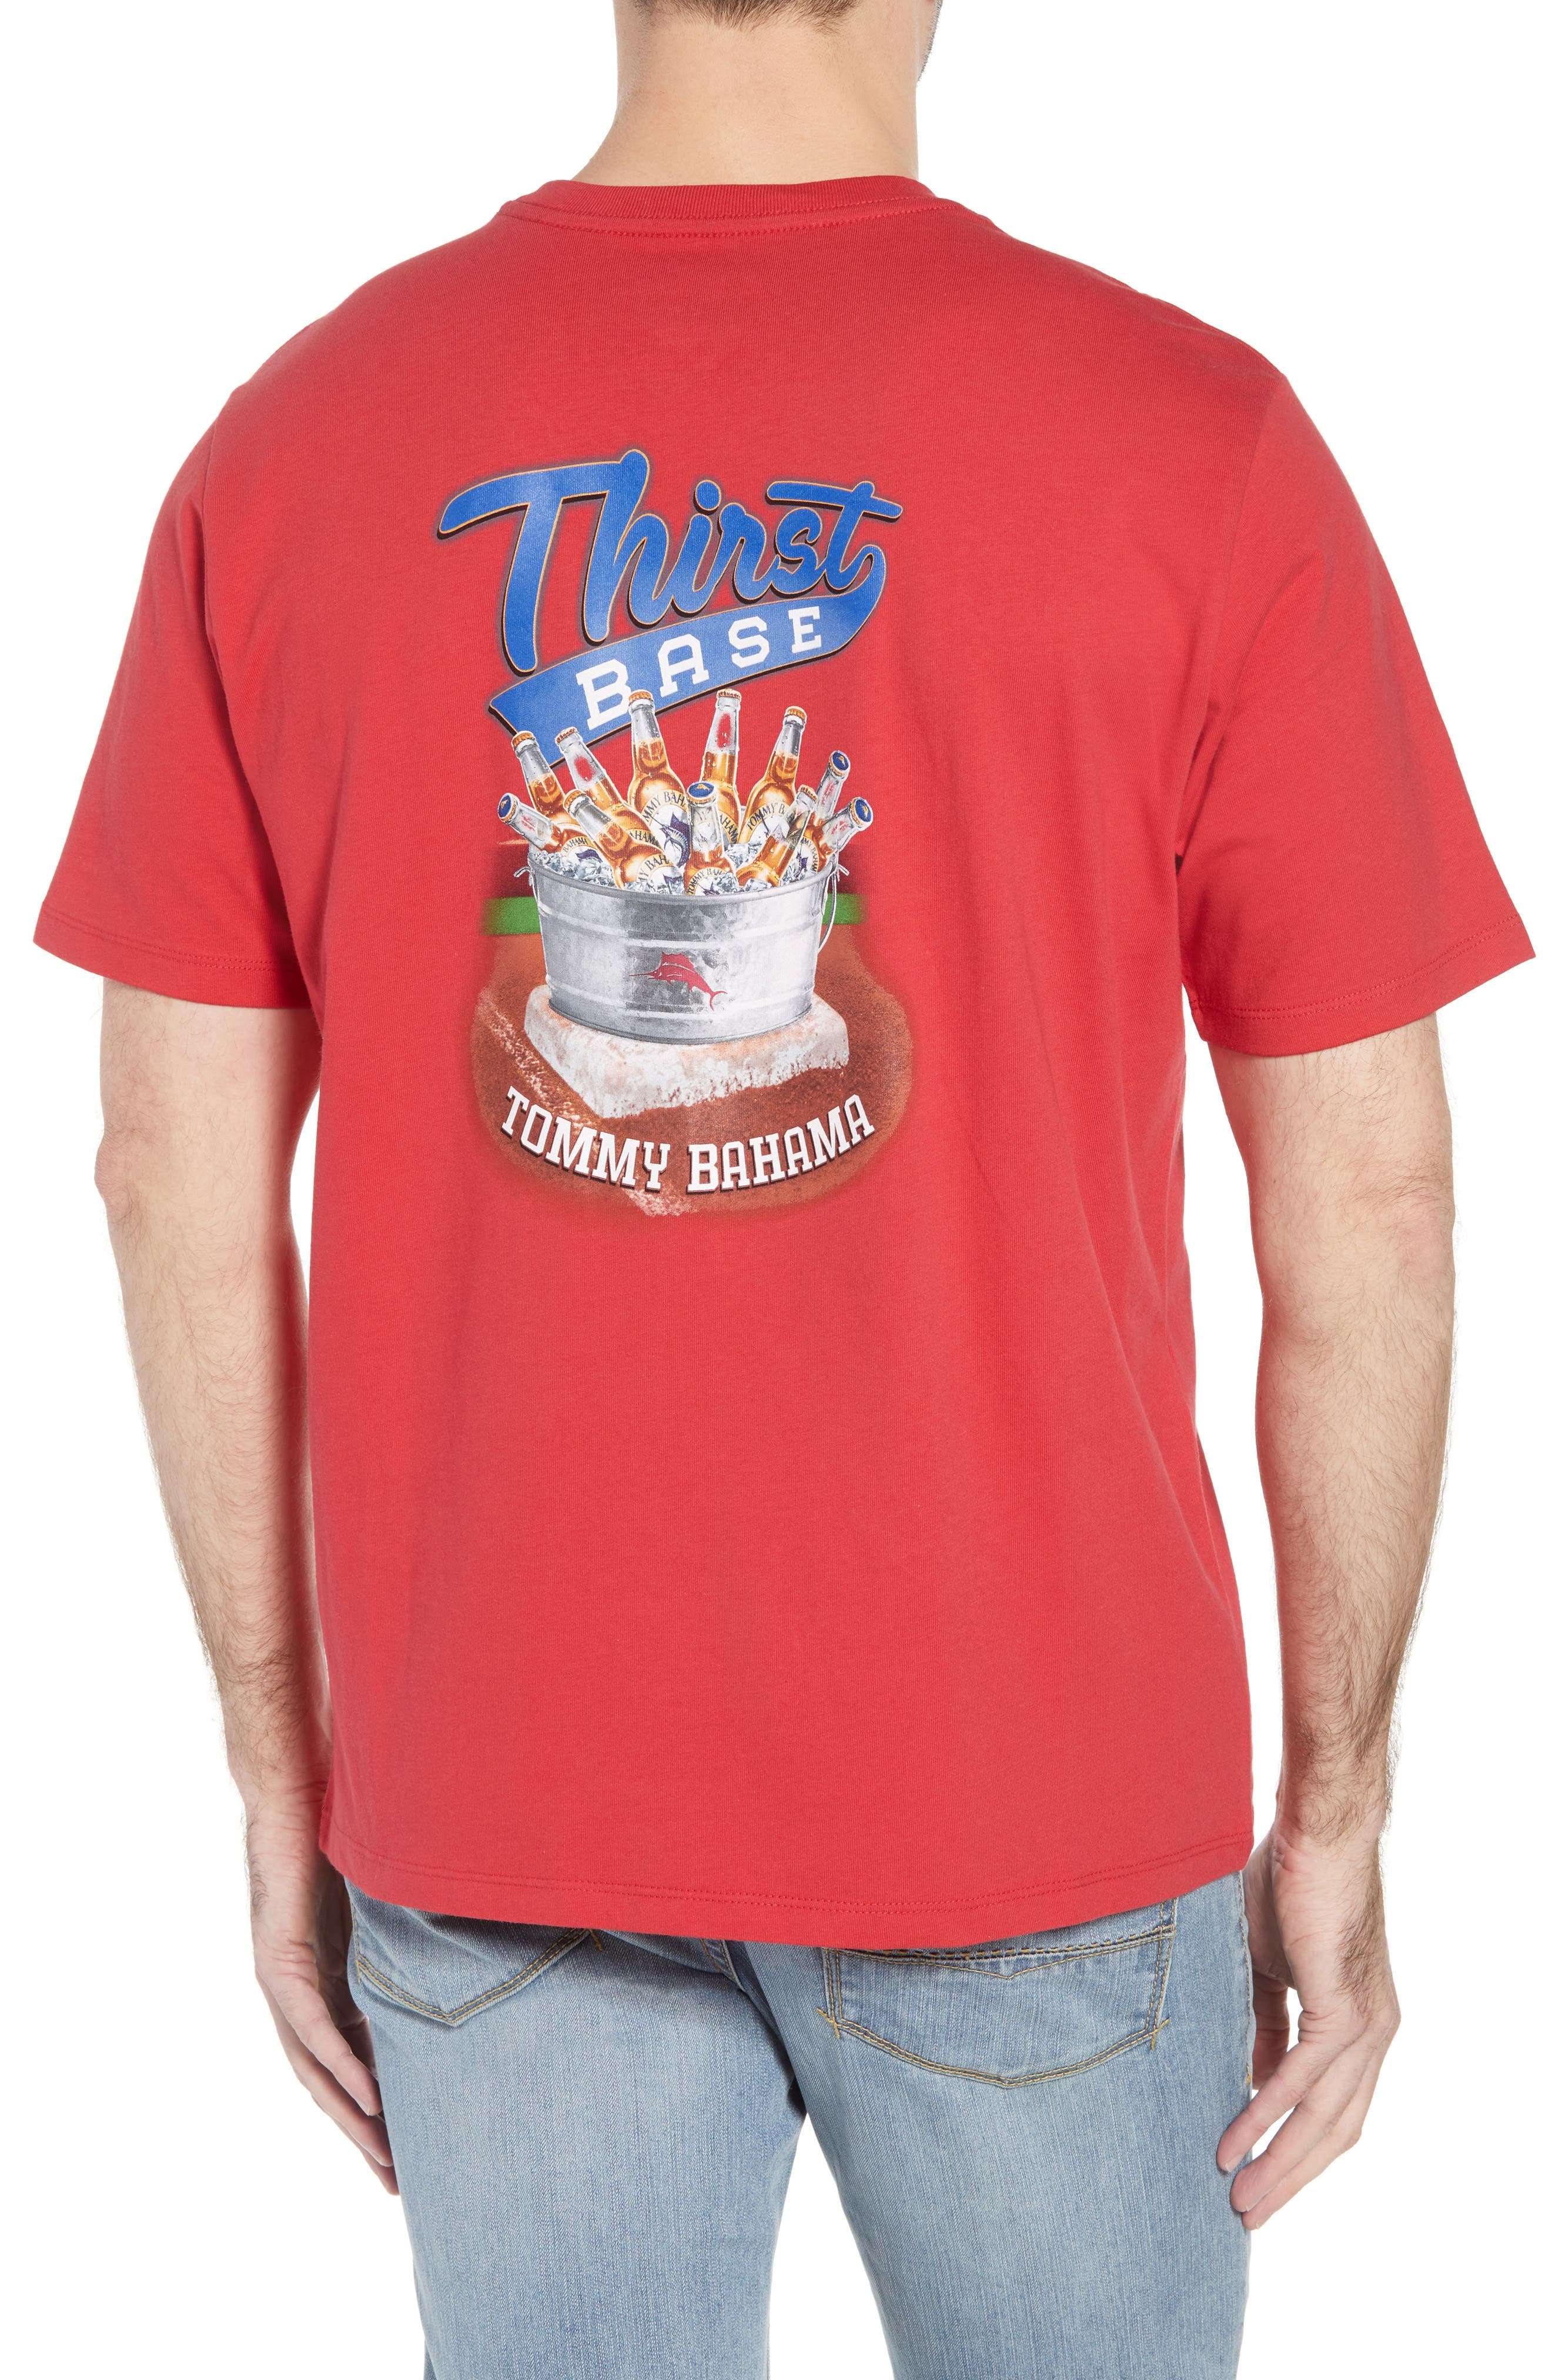 Thirst Base T-Shirt,                             Alternate thumbnail 2, color,                             600